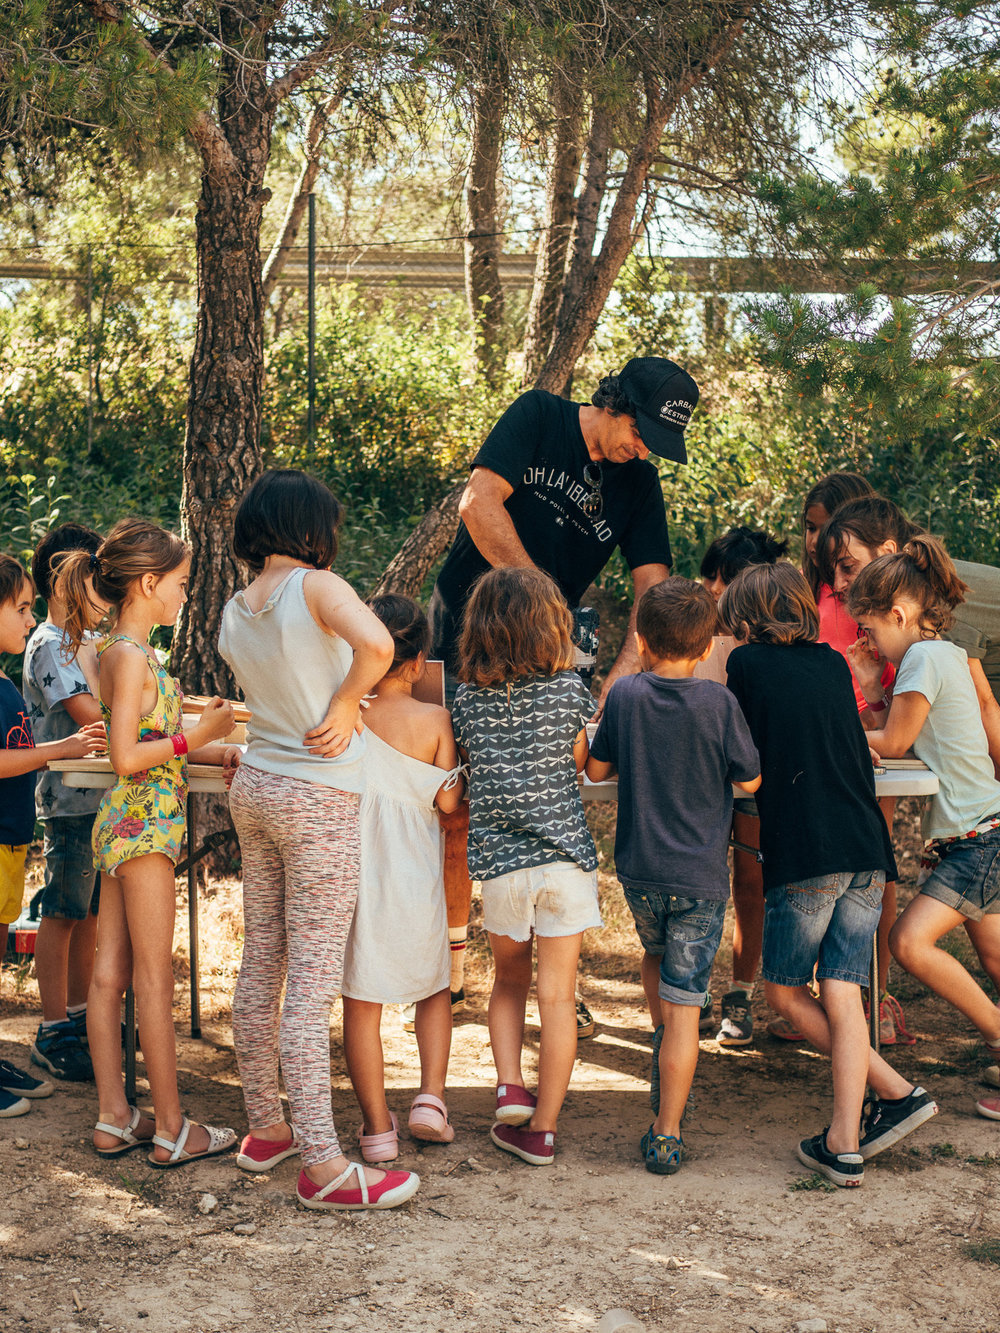 adriancanofranco_festival_inspira_07